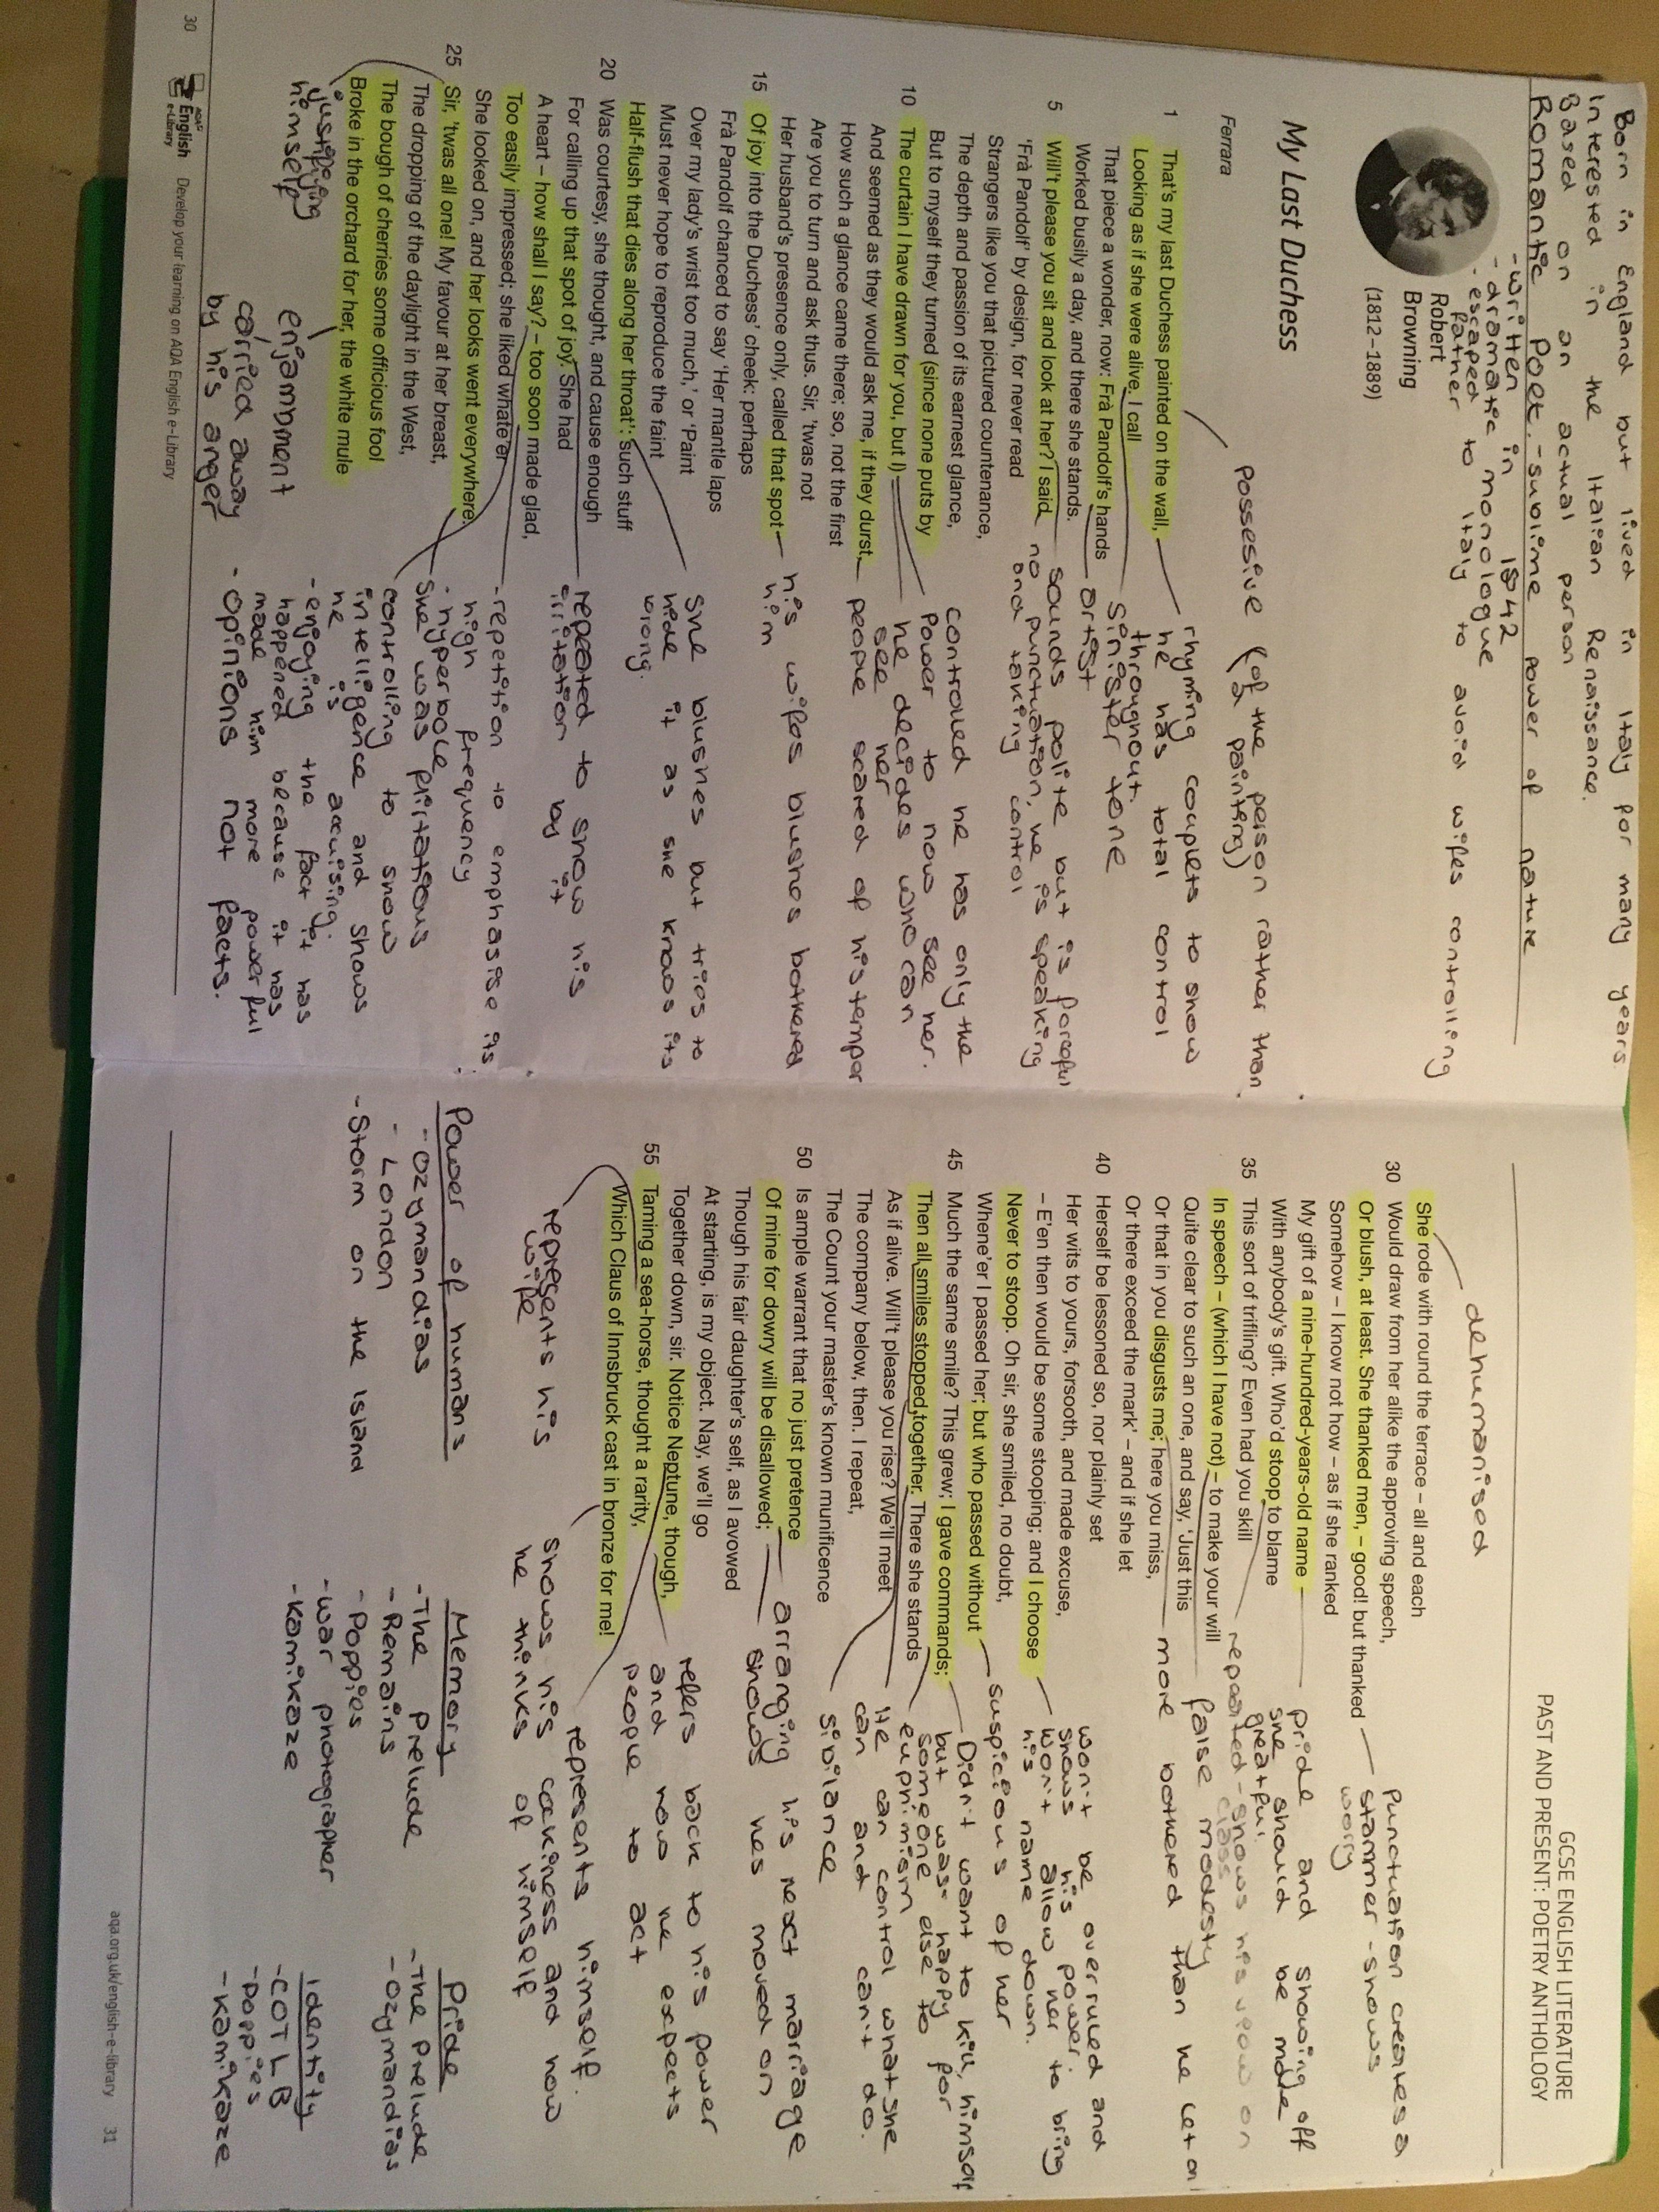 My Last Duches Gcse Poem English Literature Teaching Line By Analysis